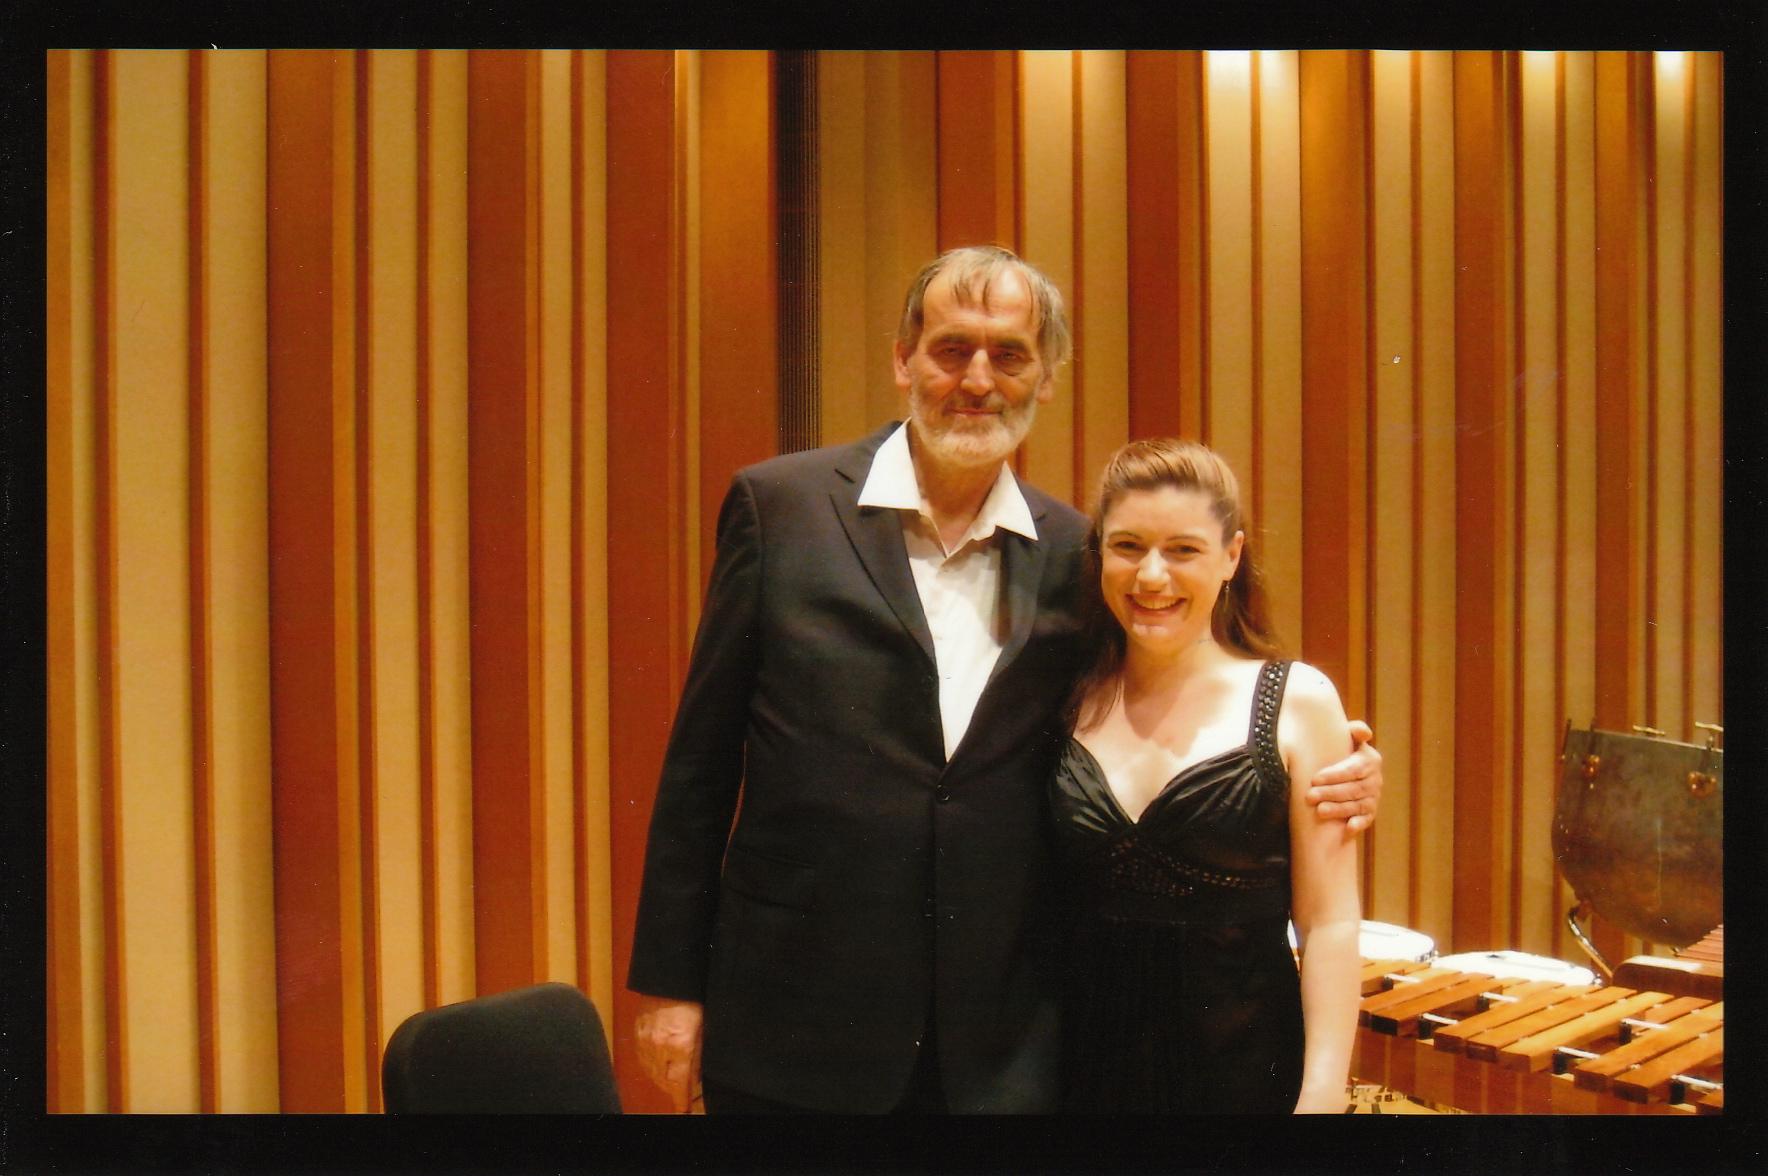 With Helmut Lachenmann